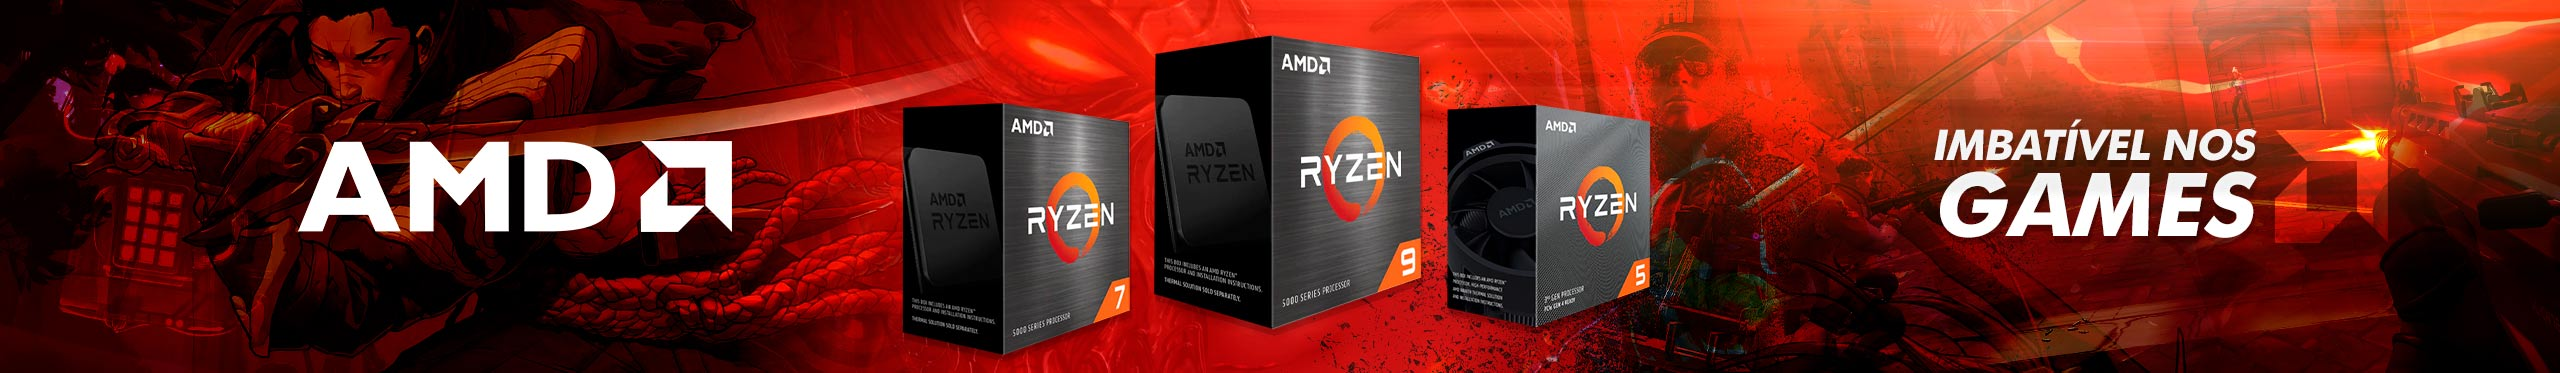 Banner 2 AMD